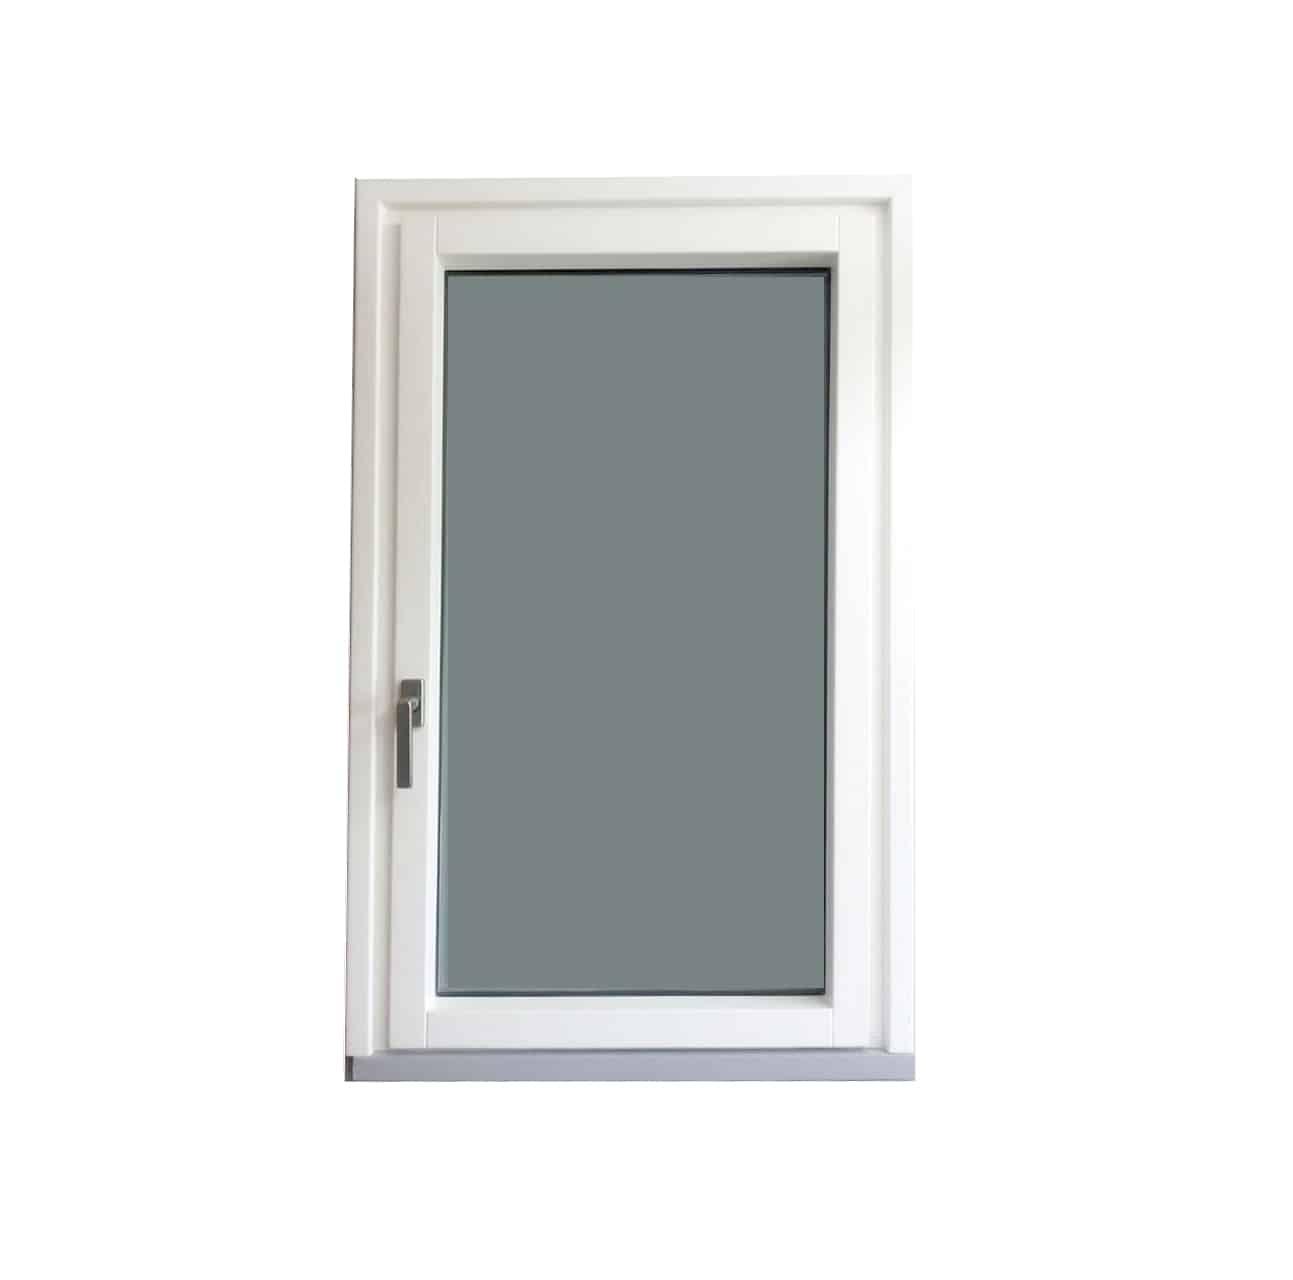 Finestre oknoplast prezzi simple finestre oknoplast - Quanto costa una finestra ...